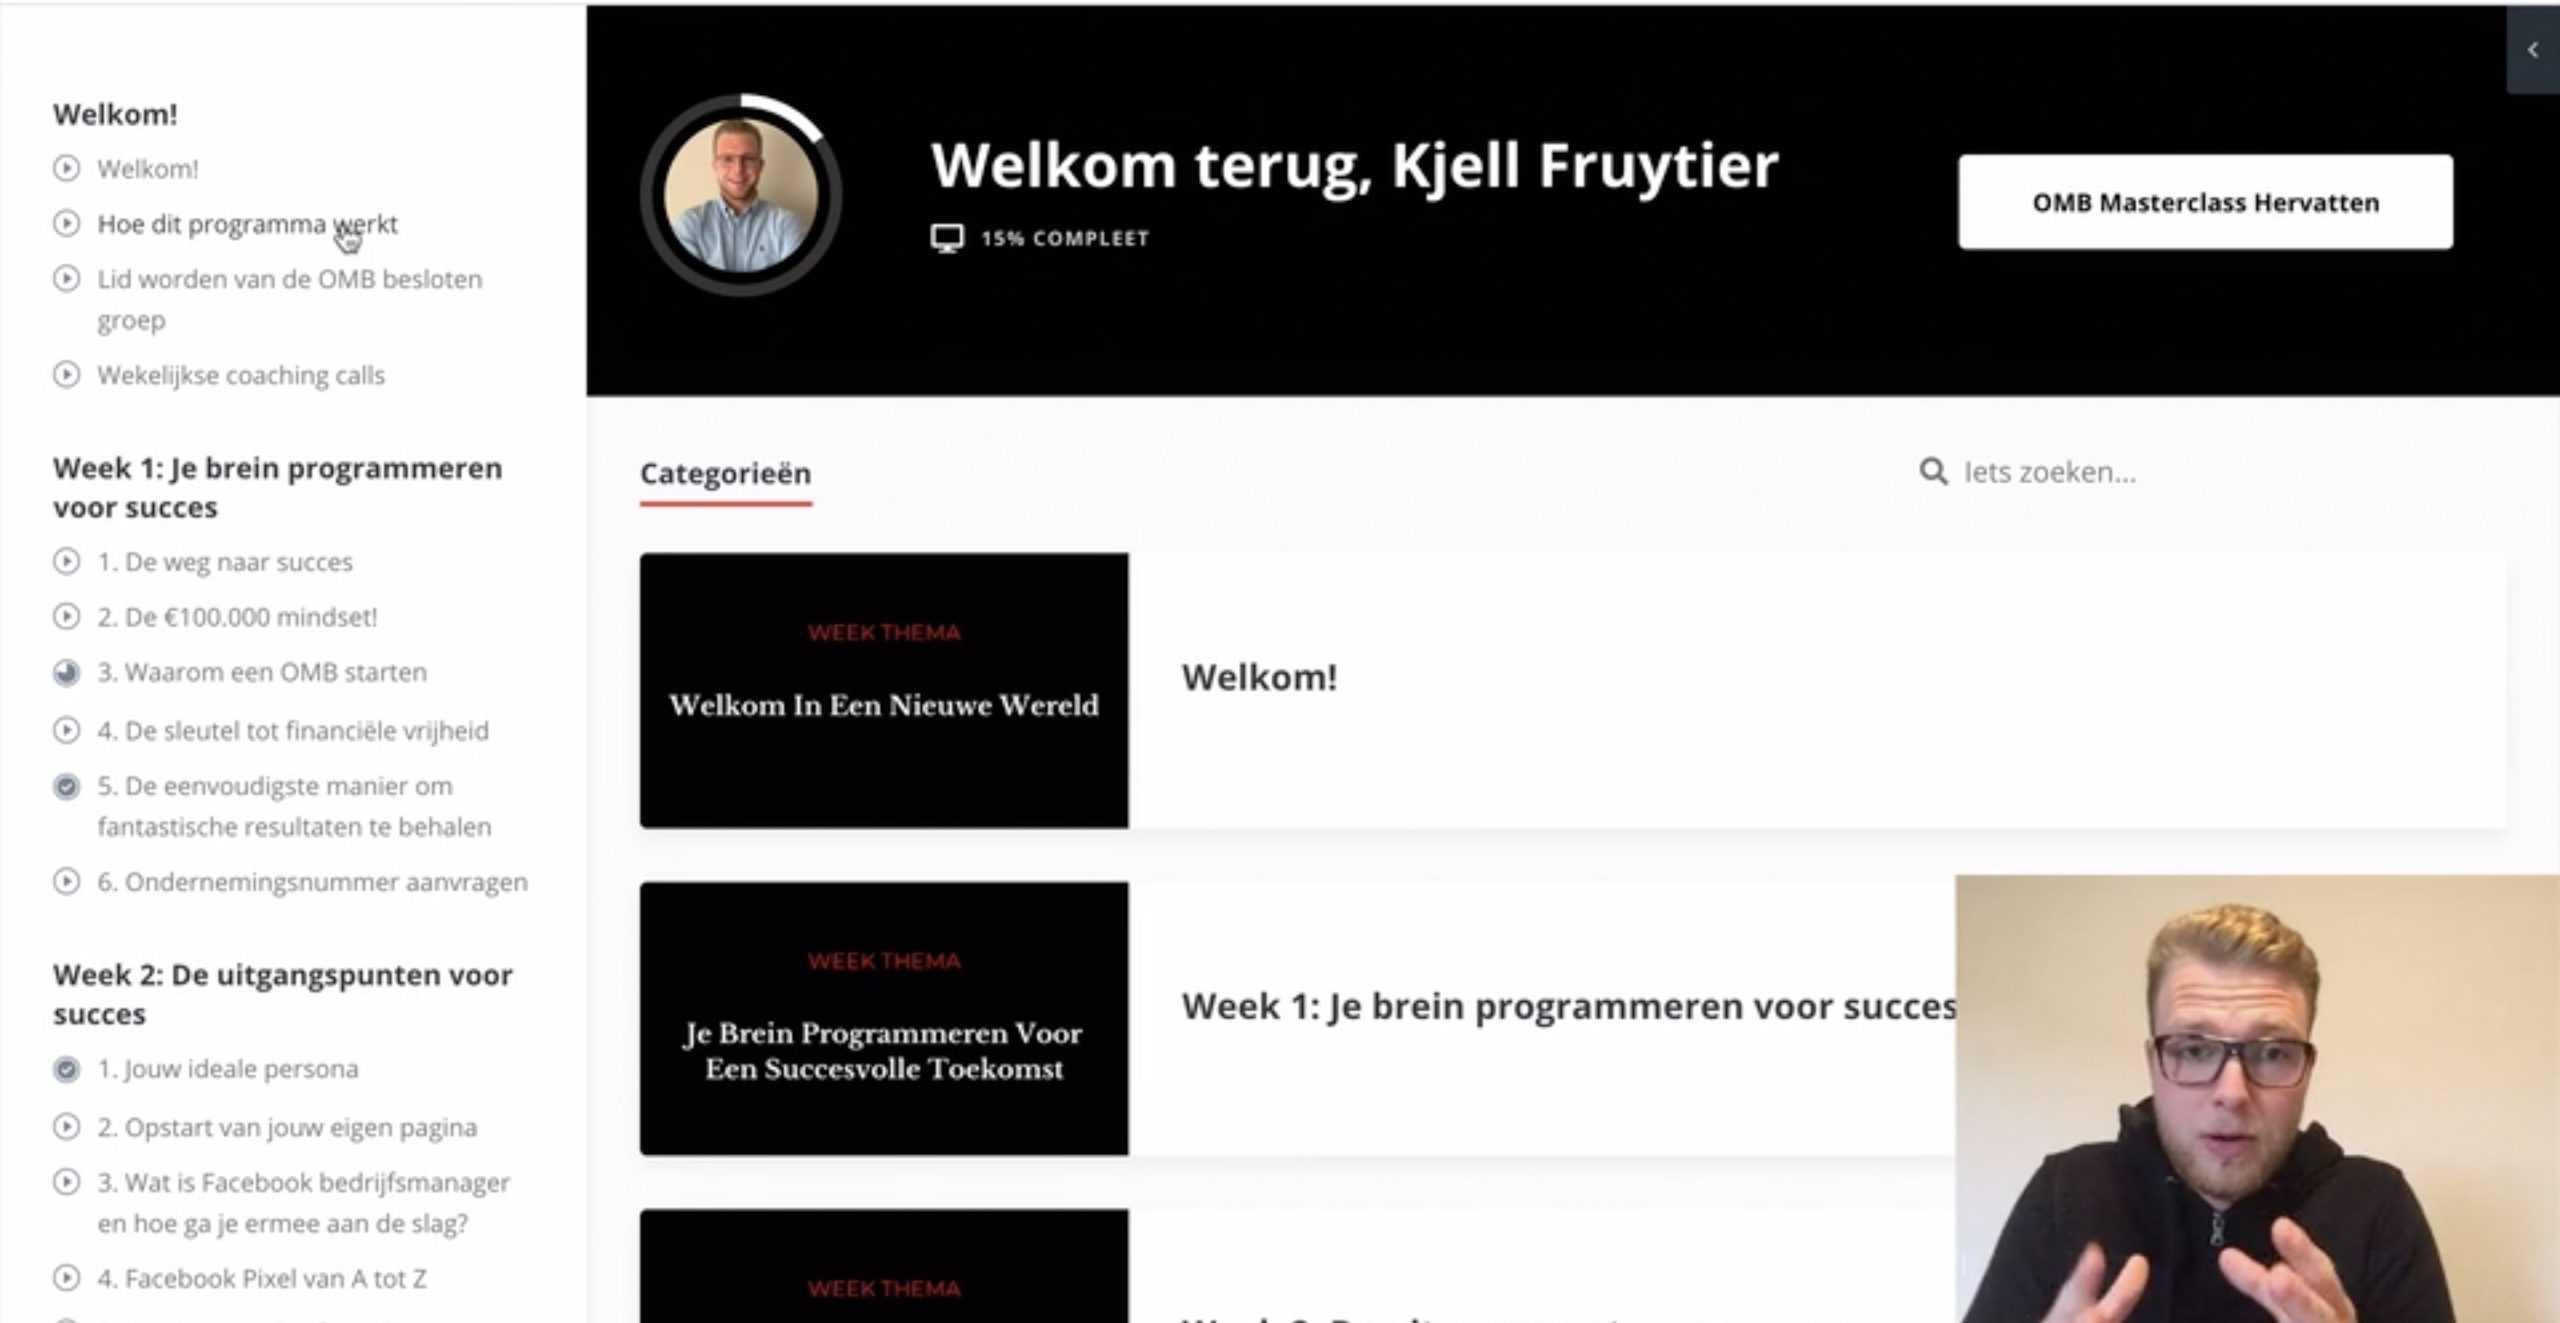 Kjell Fruytier OMB Masterclass dashboard